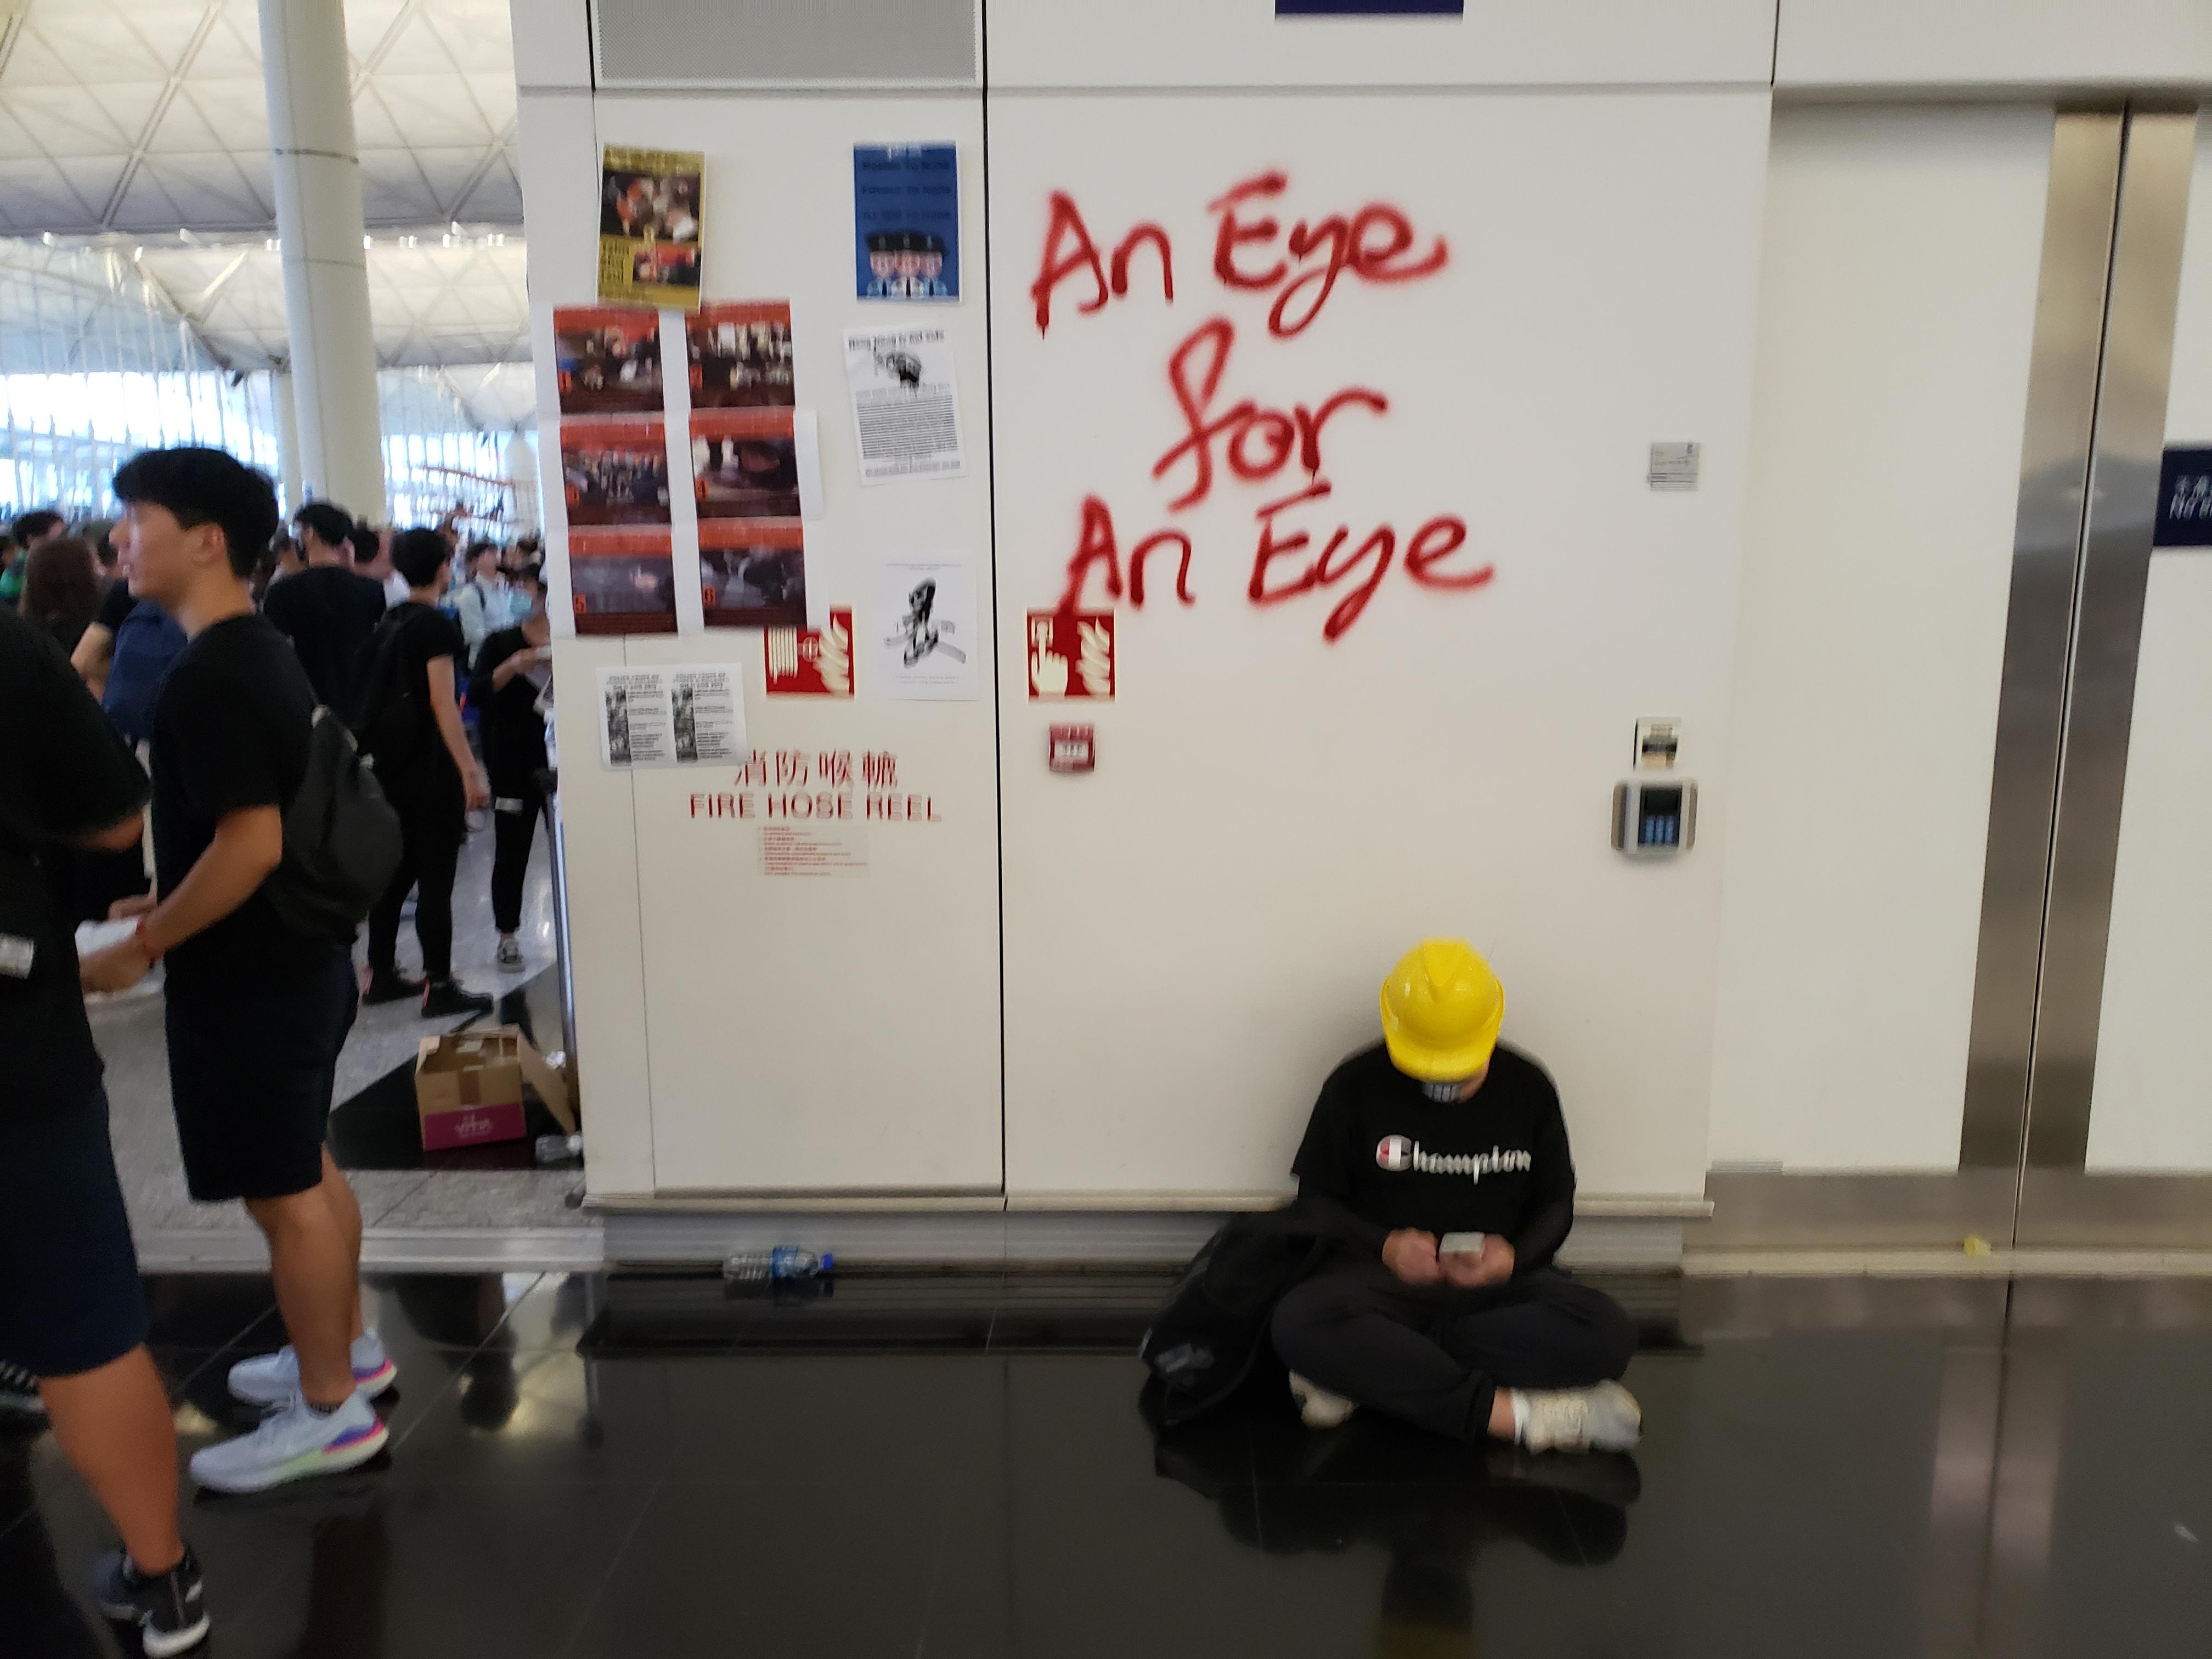 A protester takes a break under graffiti at Hong Kong airport on Monday night.